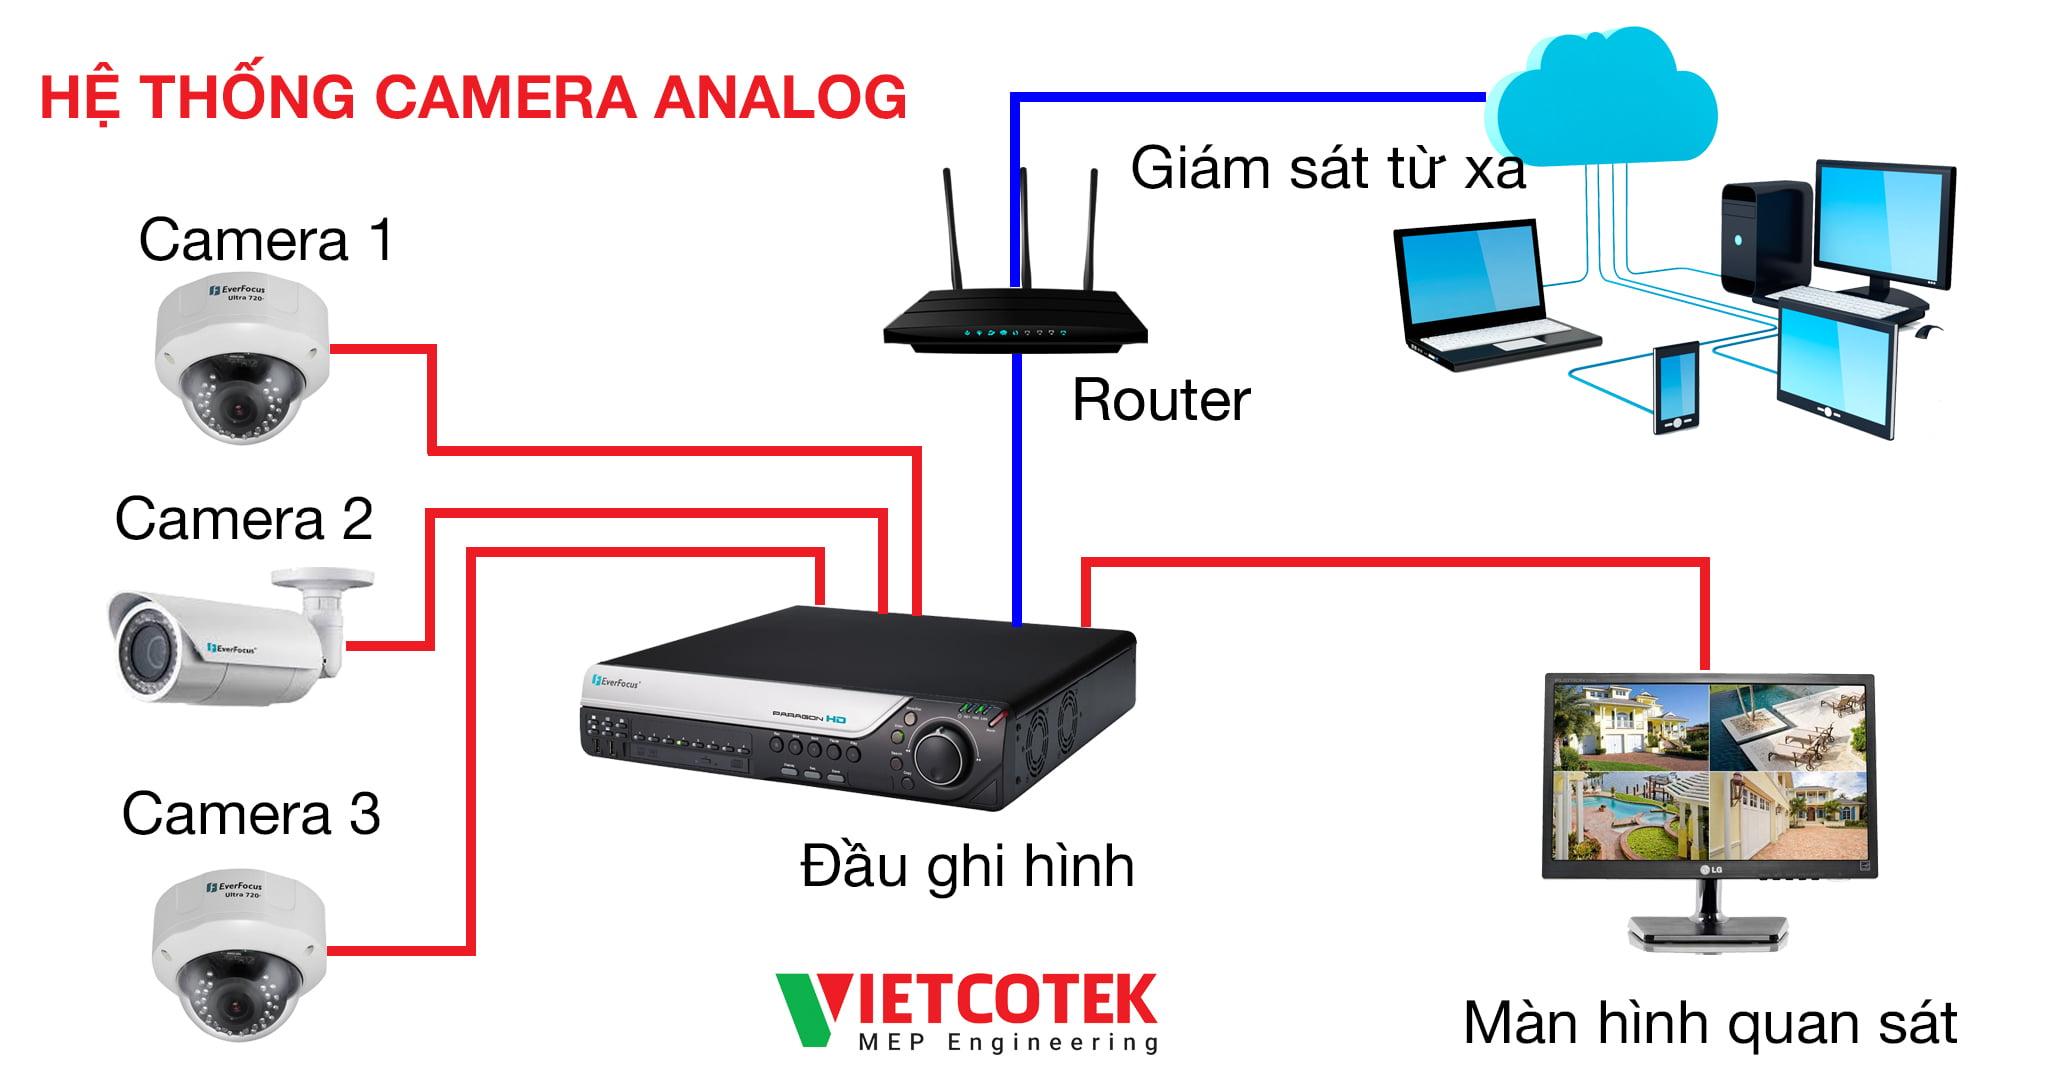 he-thong-camera-analog-vietcotek